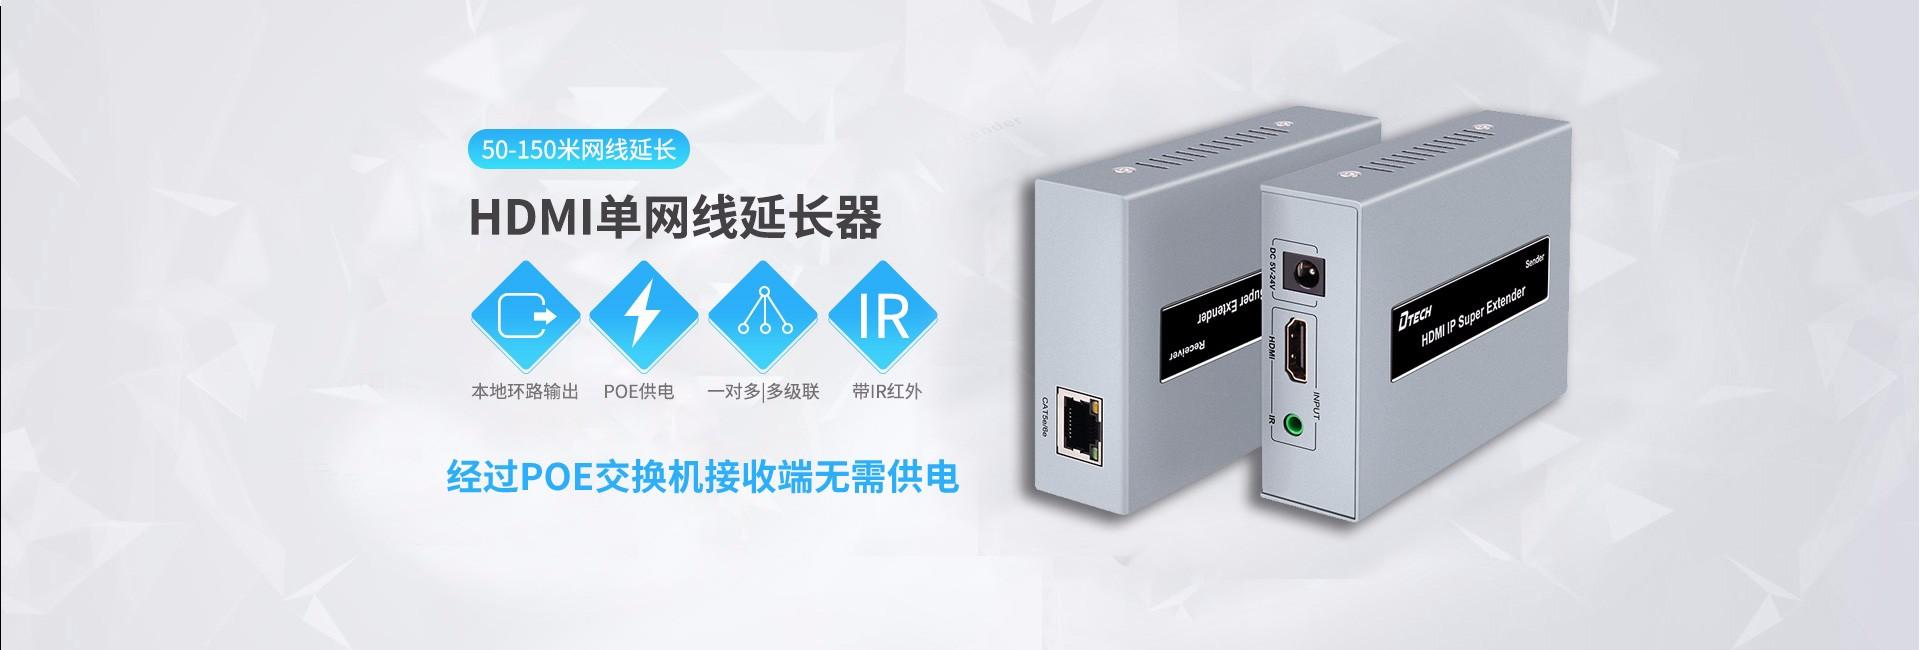 HDMI单网线延长器